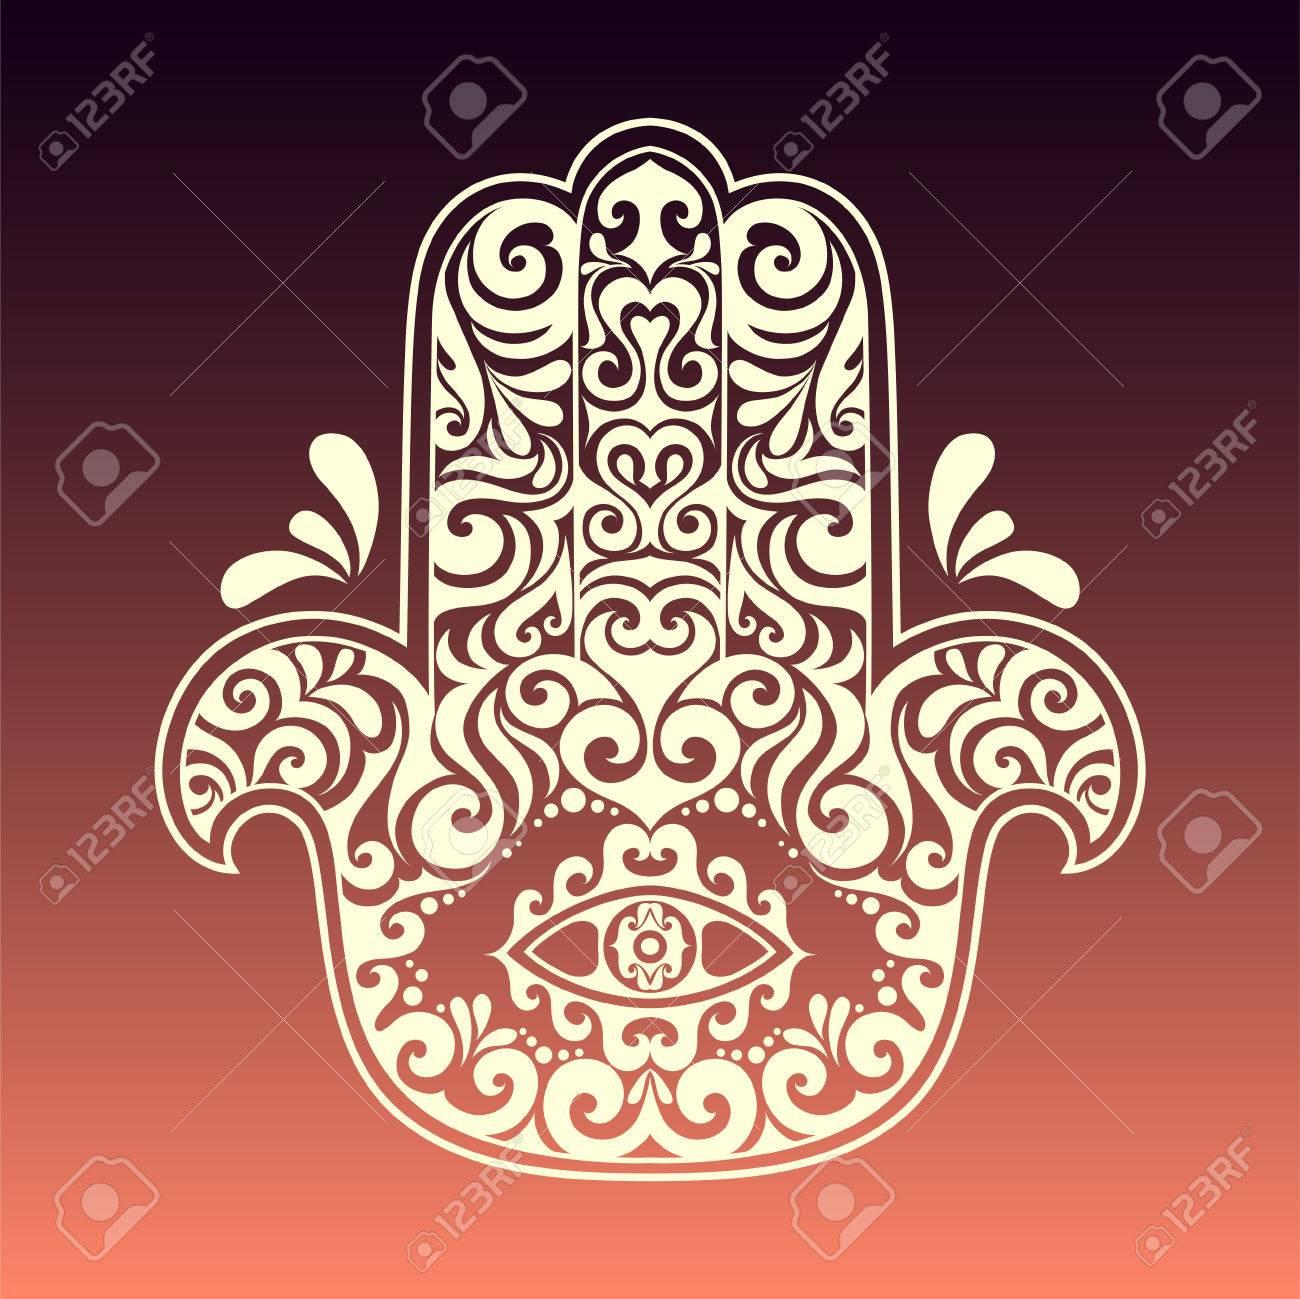 Vector Hamsa Hand Drawn Symbol With Tribal Ethnic Floral Monochrome